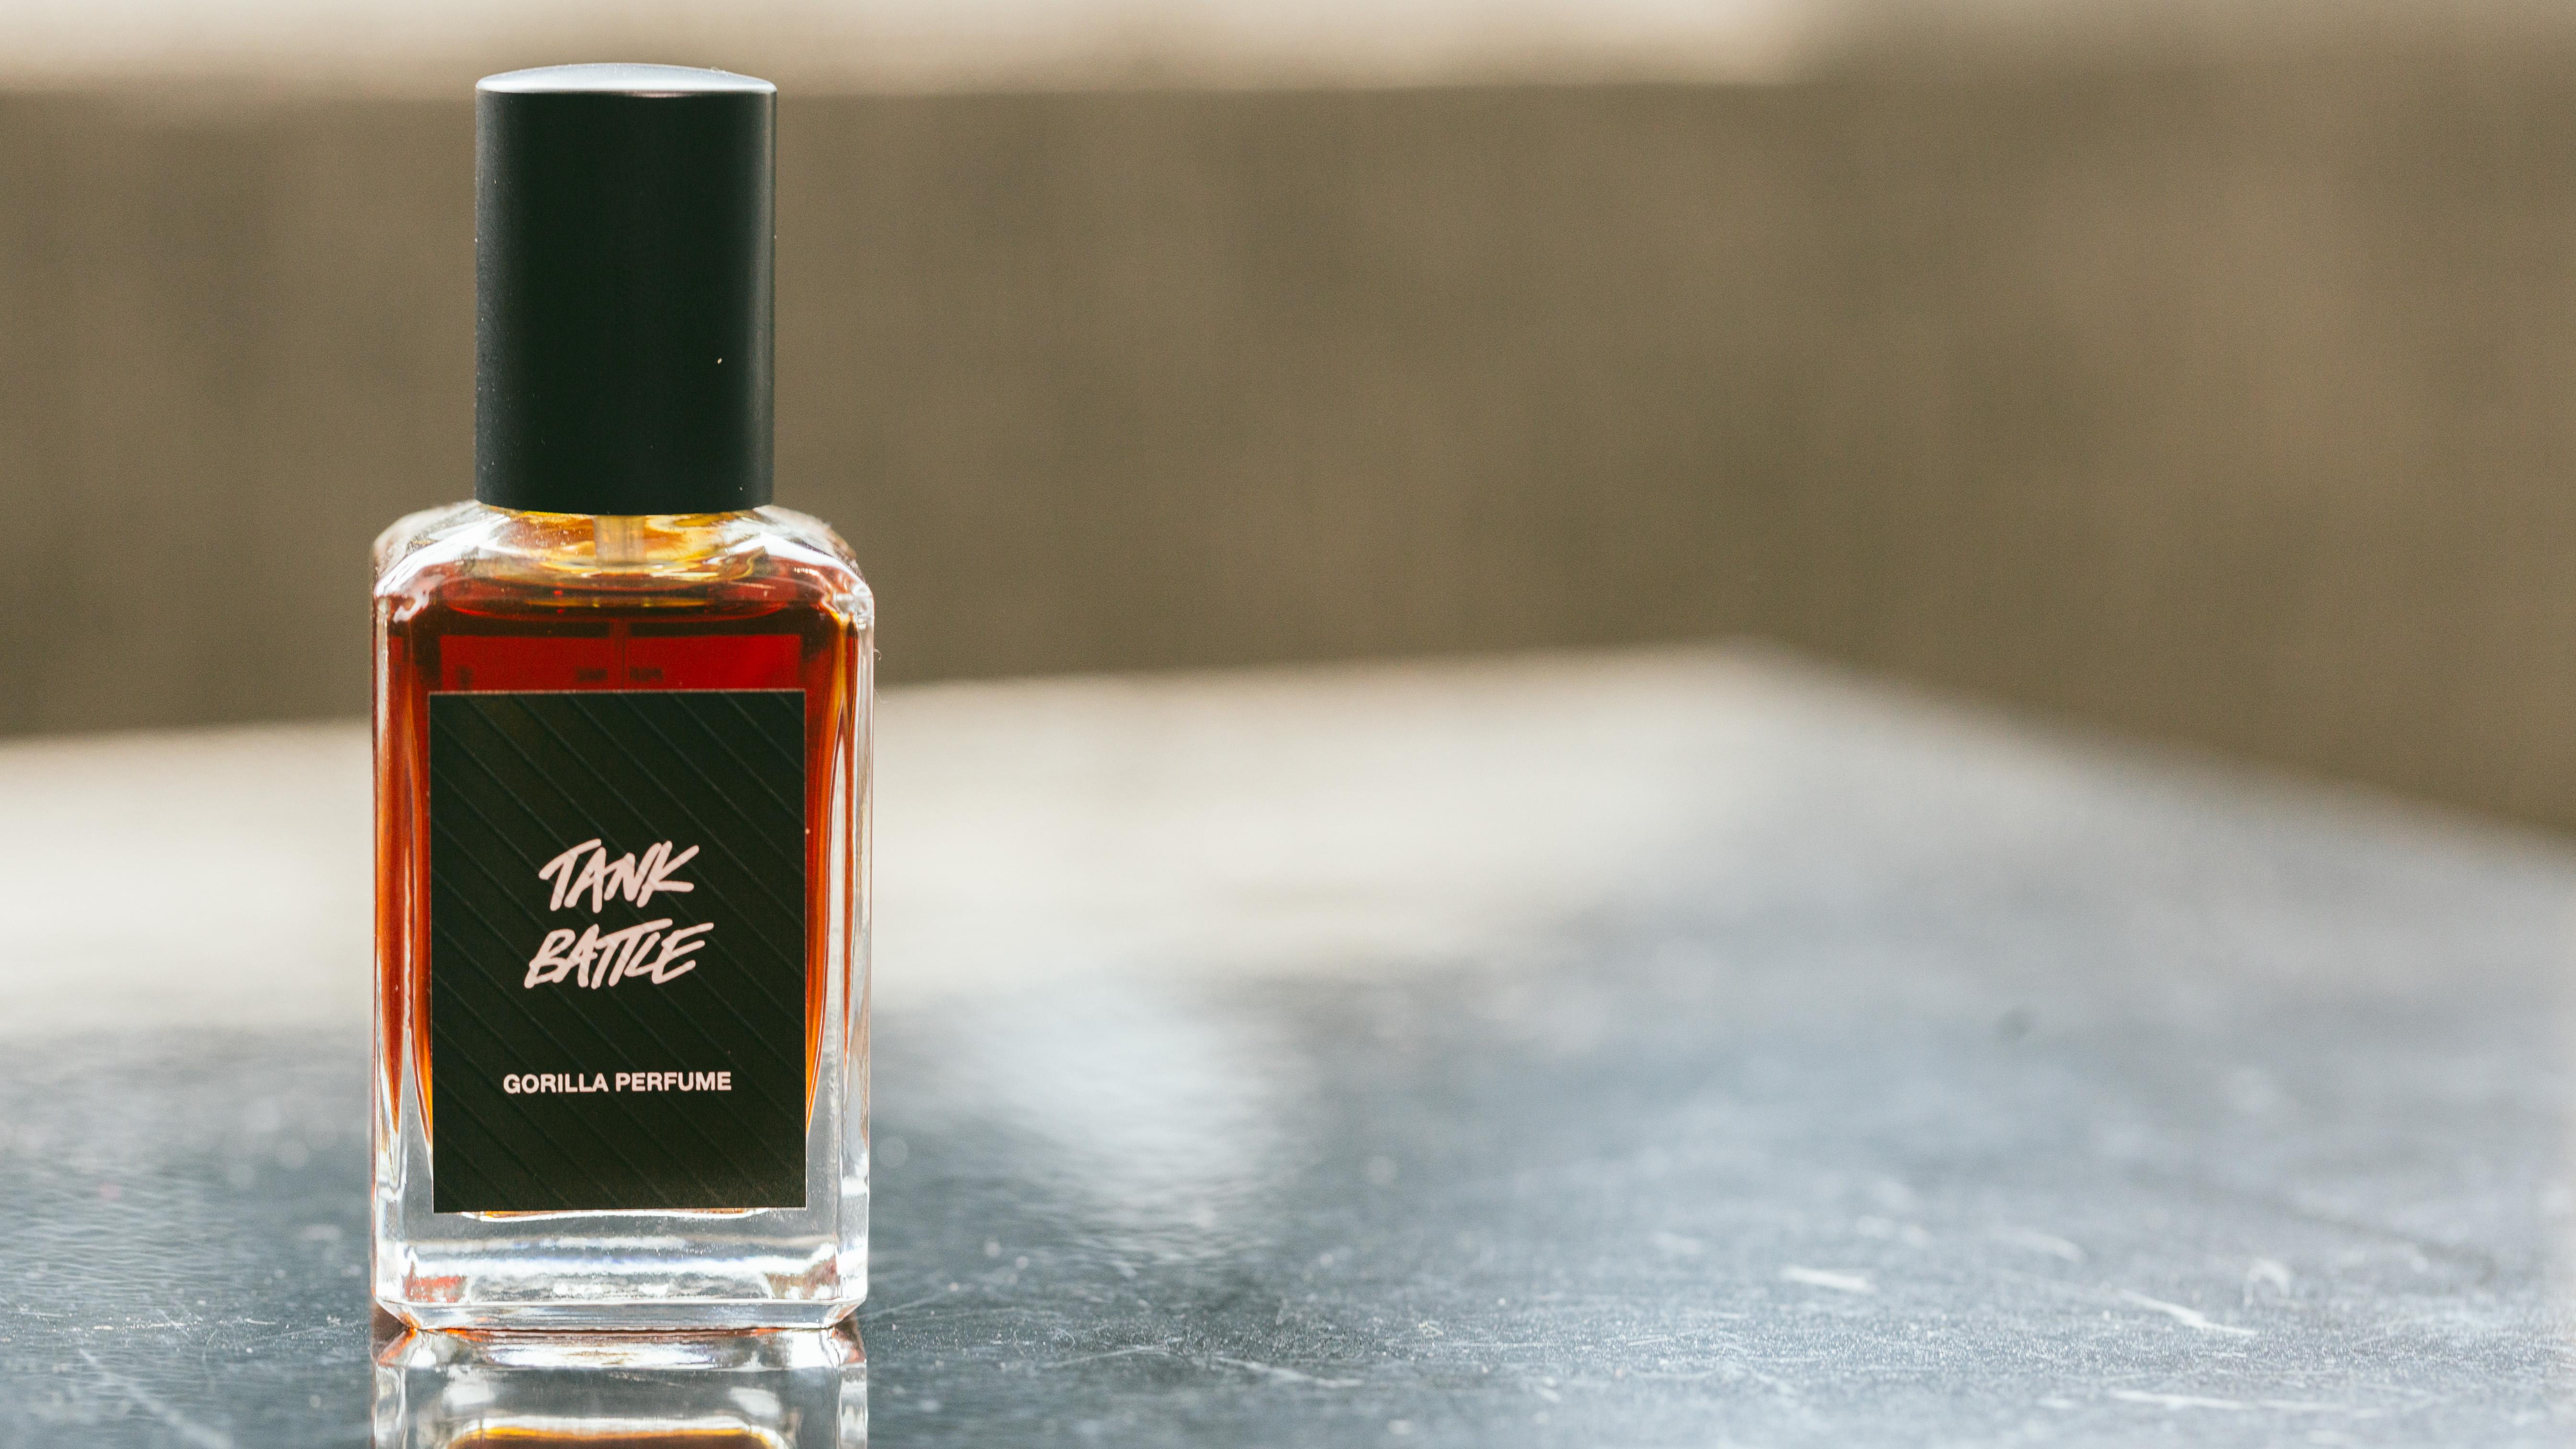 Lush Tank Battle Gorilla Perfume